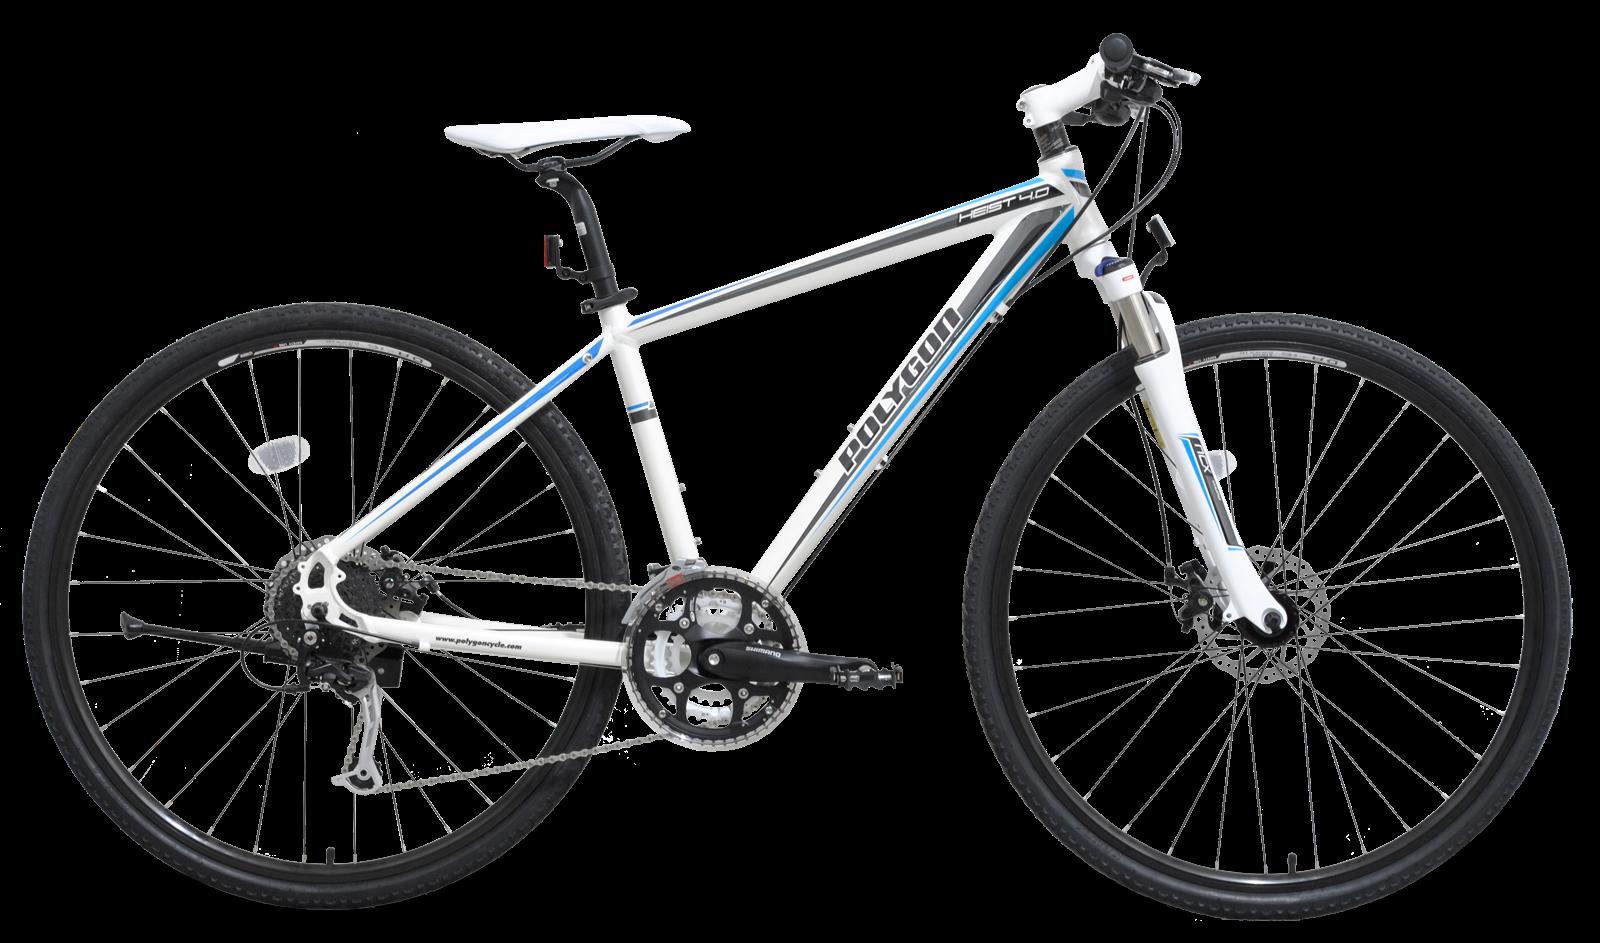 berbagi bersama doddi: Sepedah 2 Alam (Hybrid)